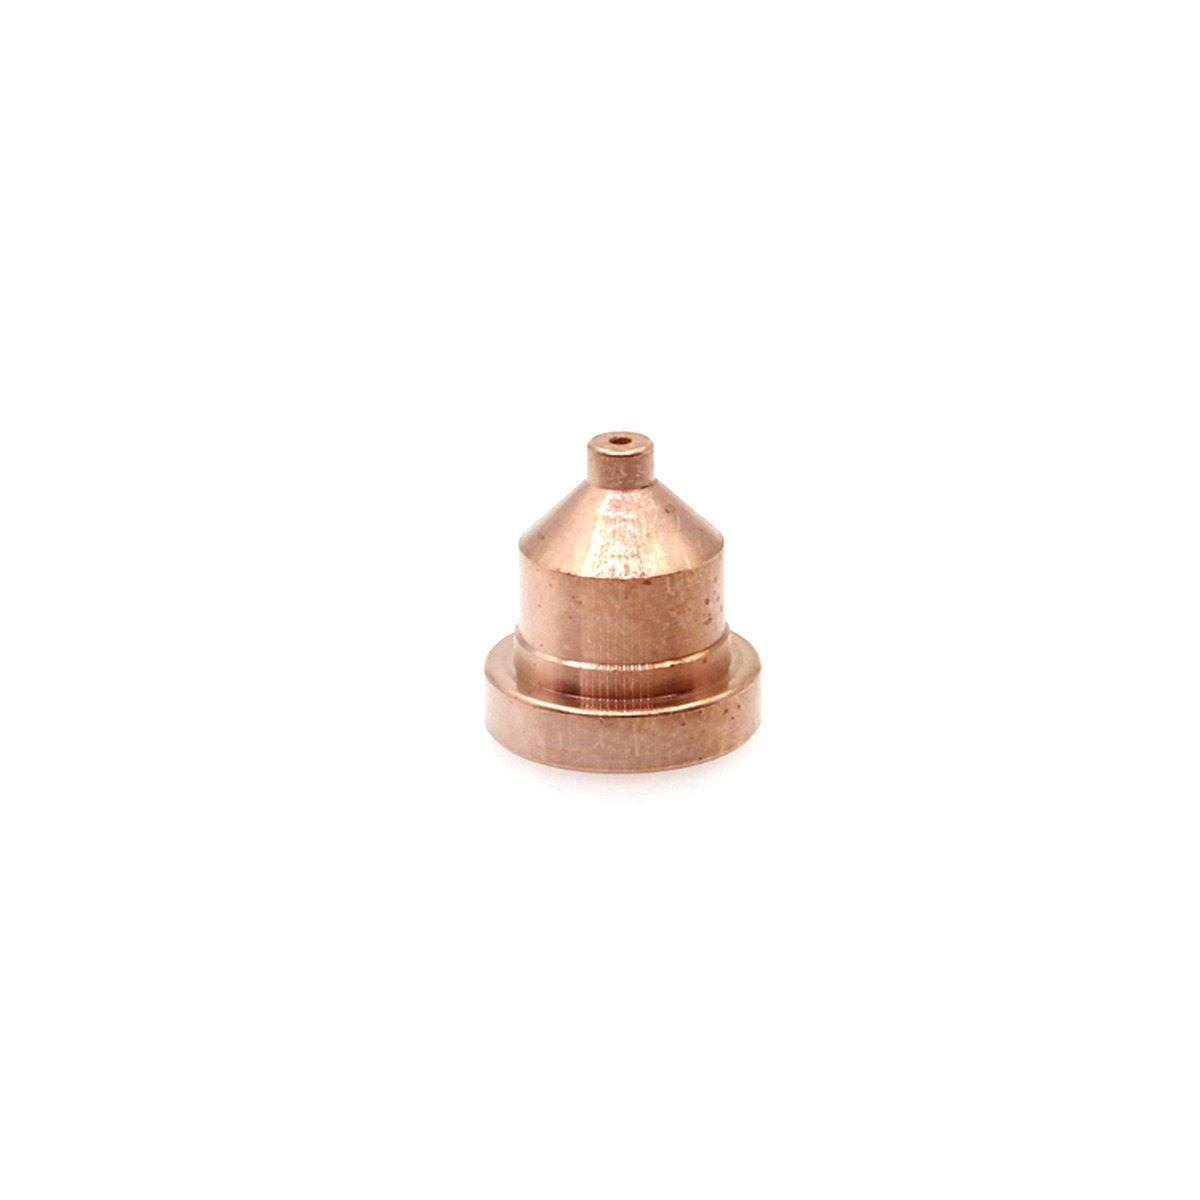 204325 Plasma Nozzle Standard Tip 40A fit Miller ICE-40T ICE-40C Torch PKG-5